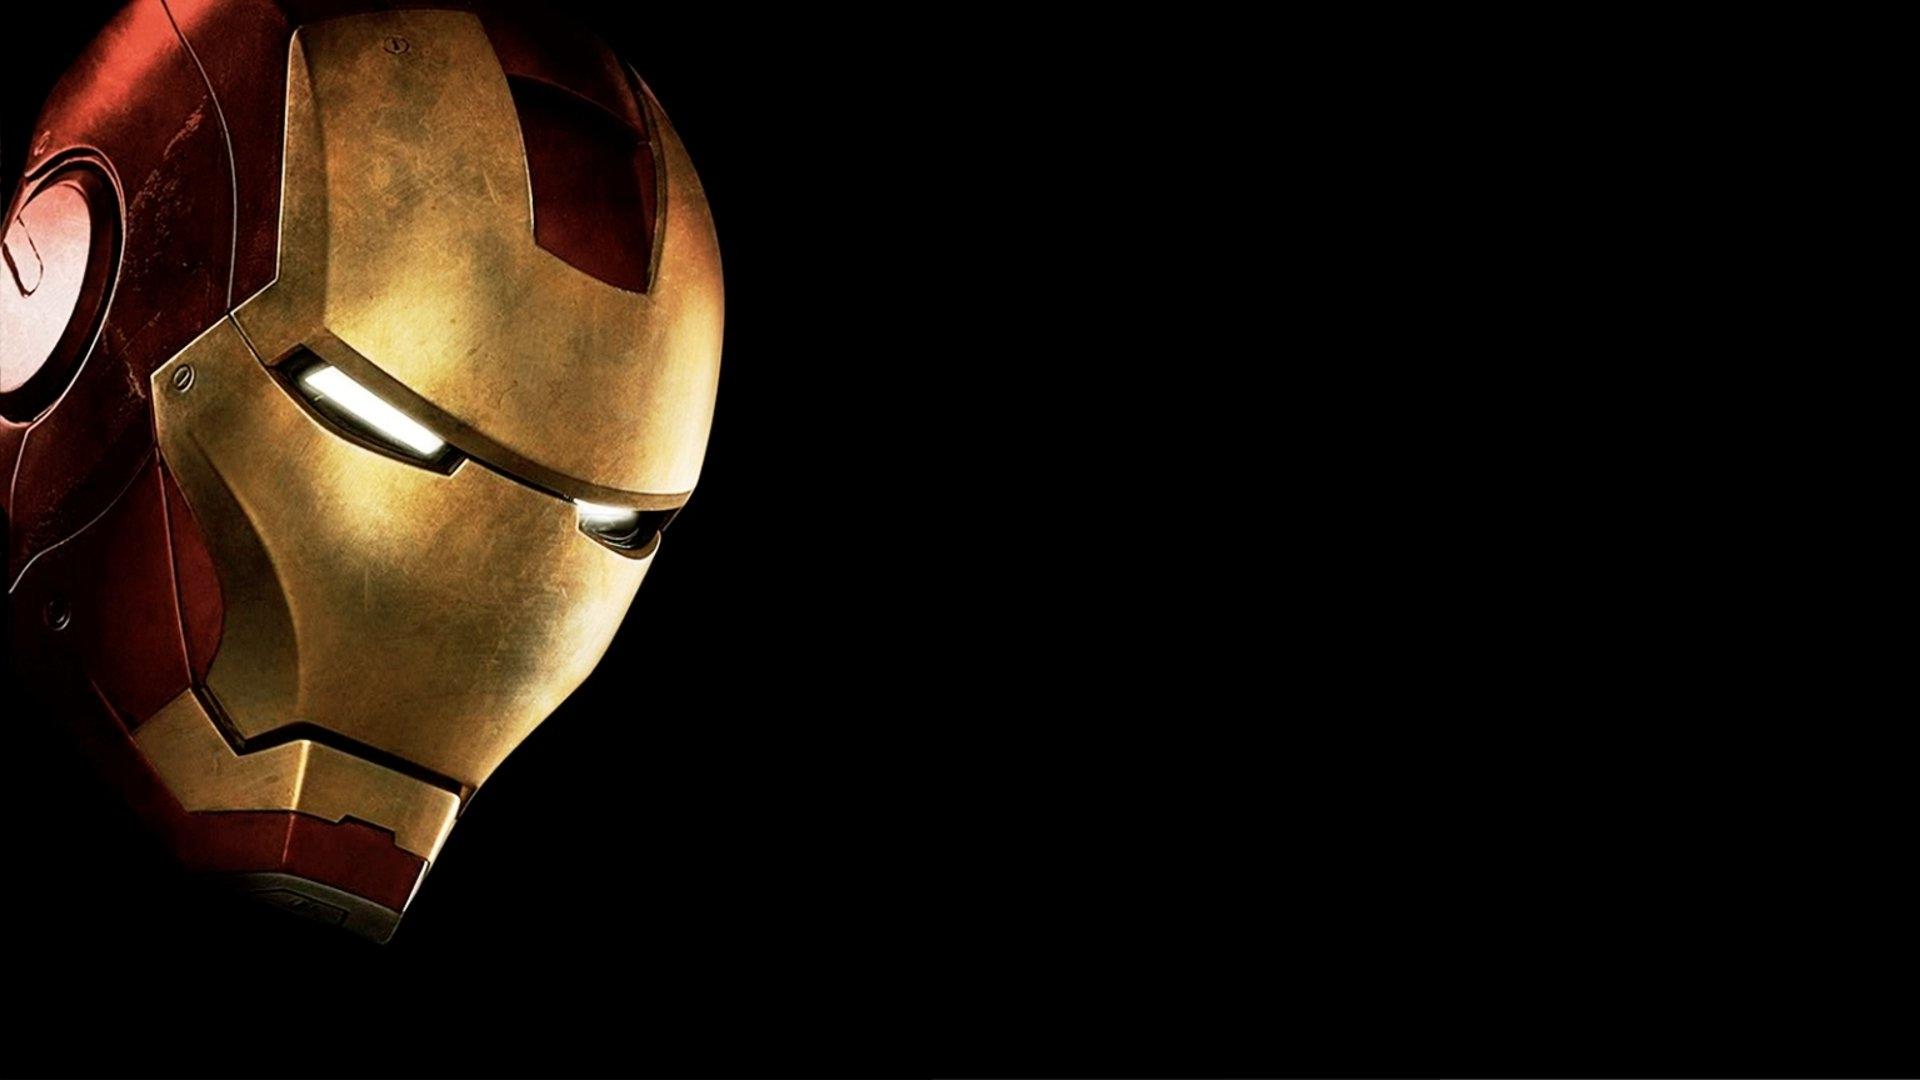 1920x1080 Px Armor Background Black Comics Iron Man Marvel Movies